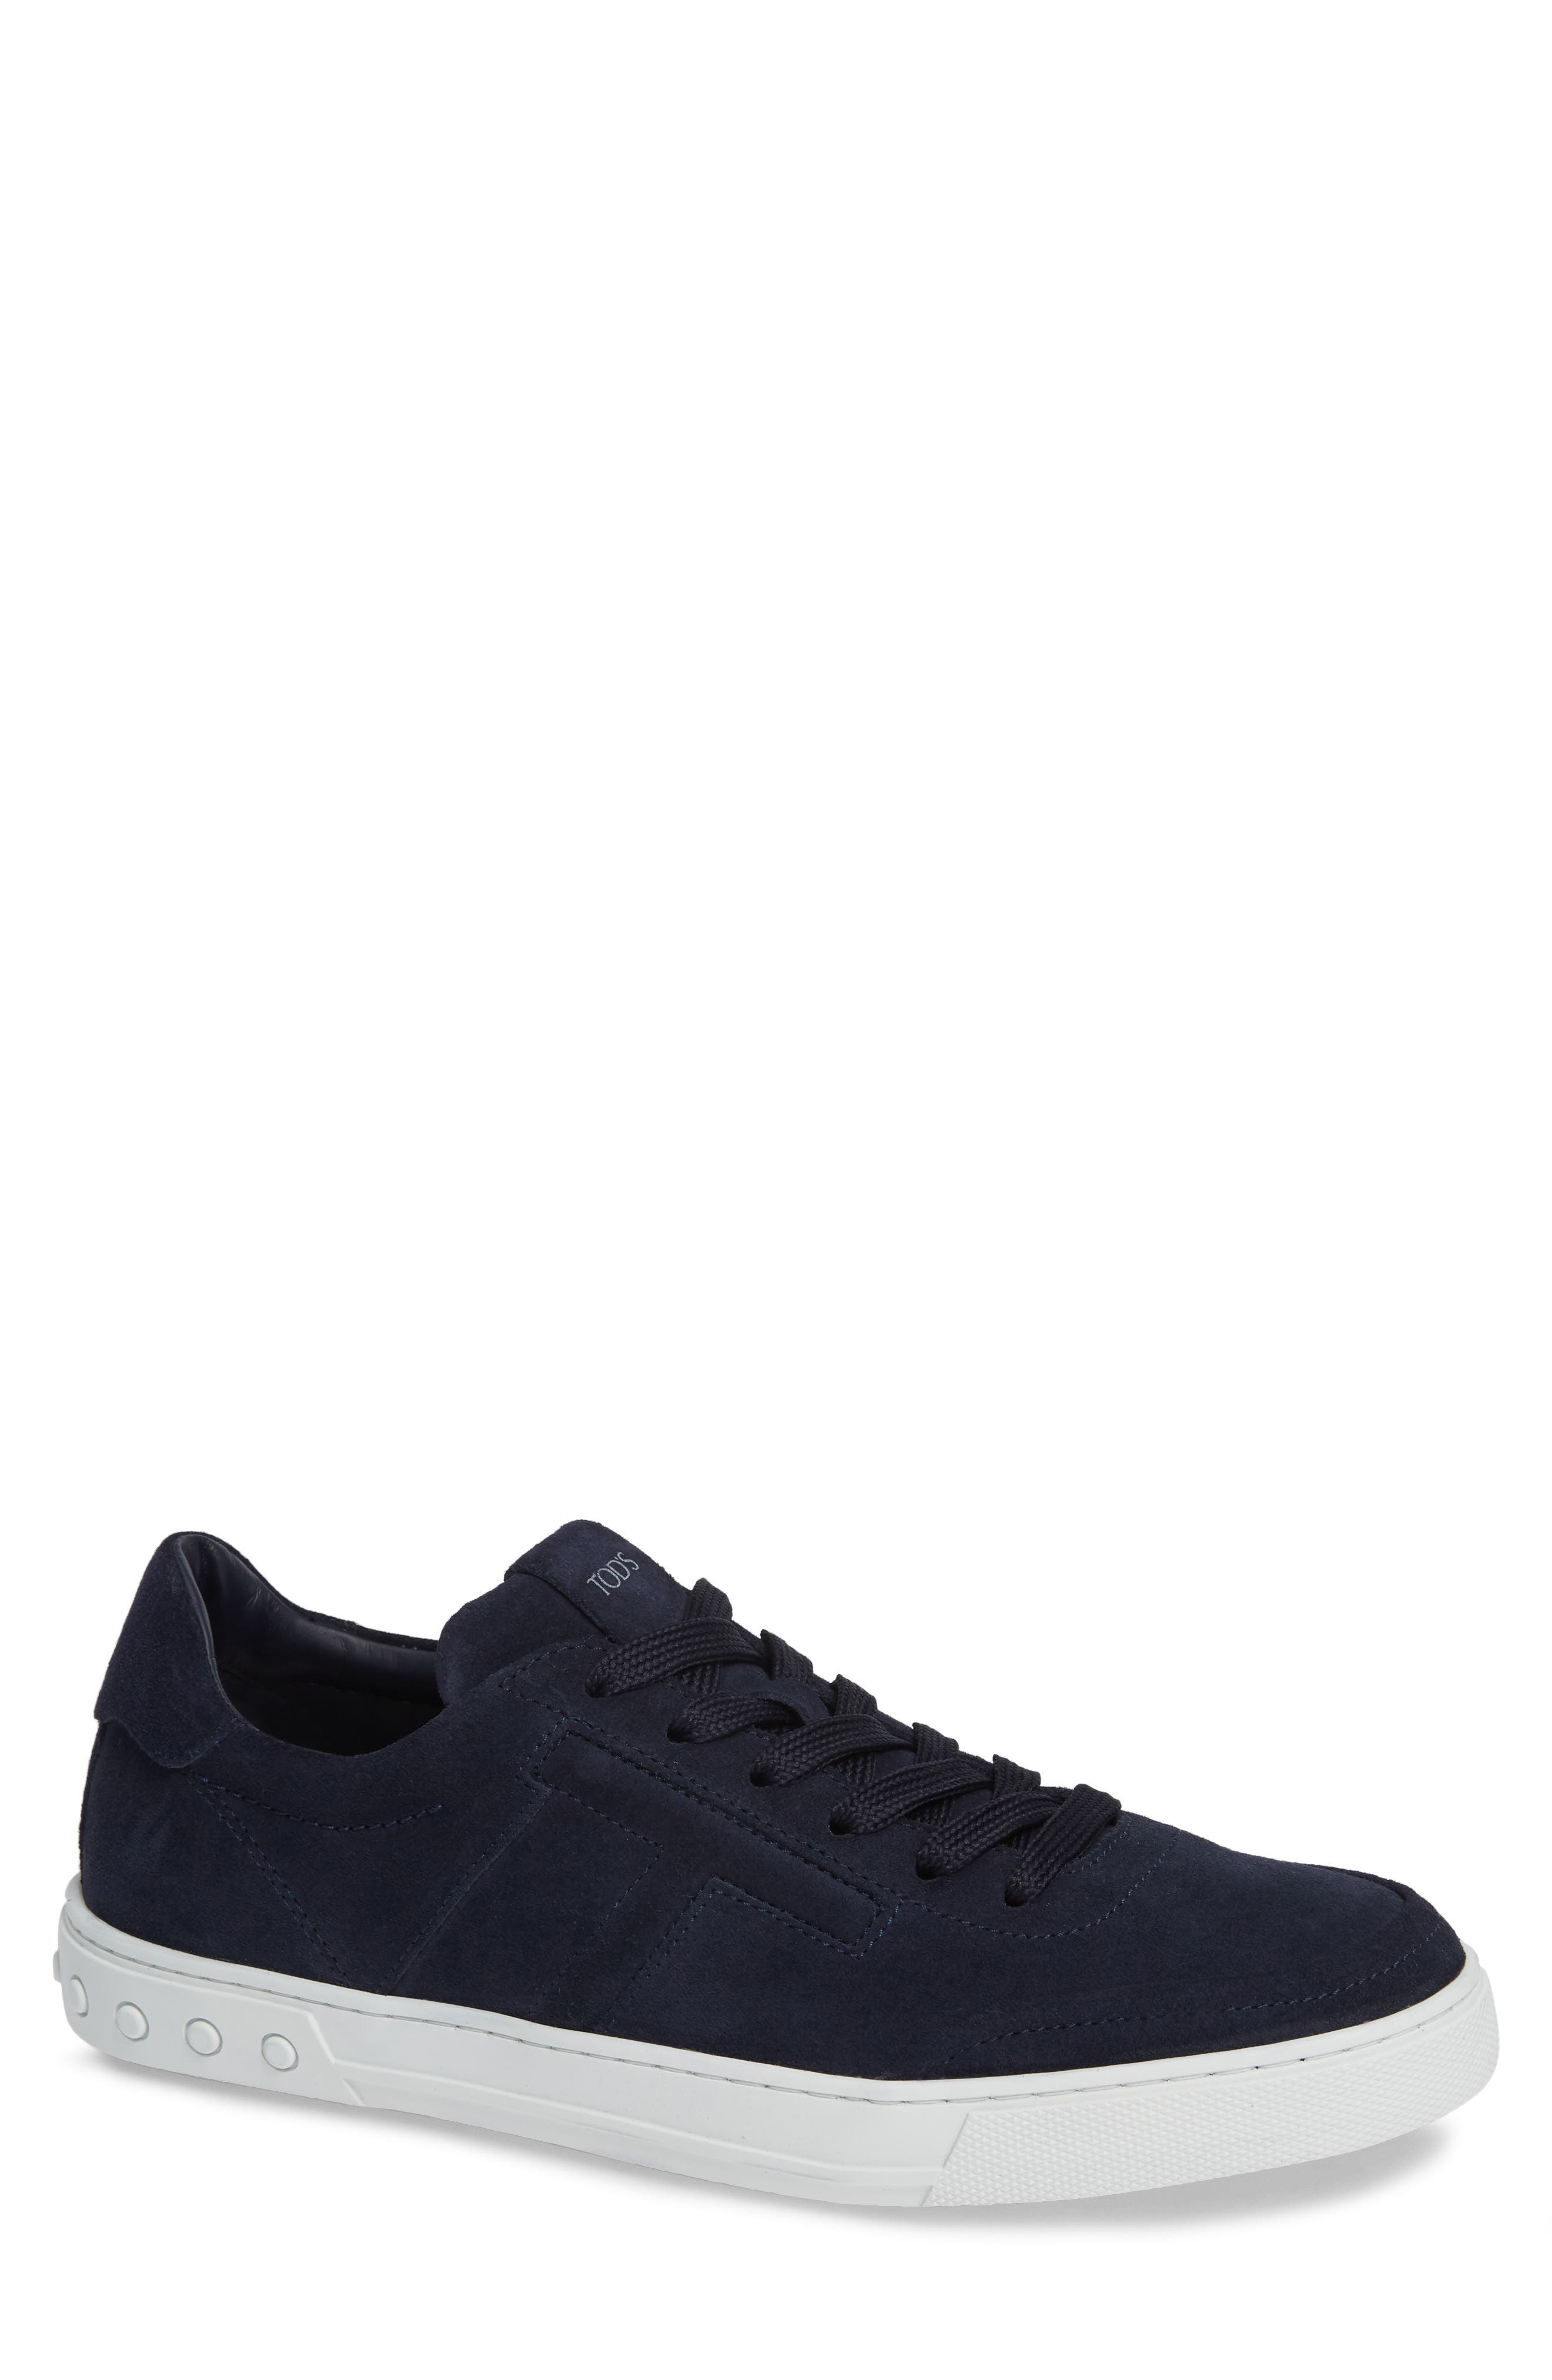 f32a7ce0bbd Tod s Men s Shoes